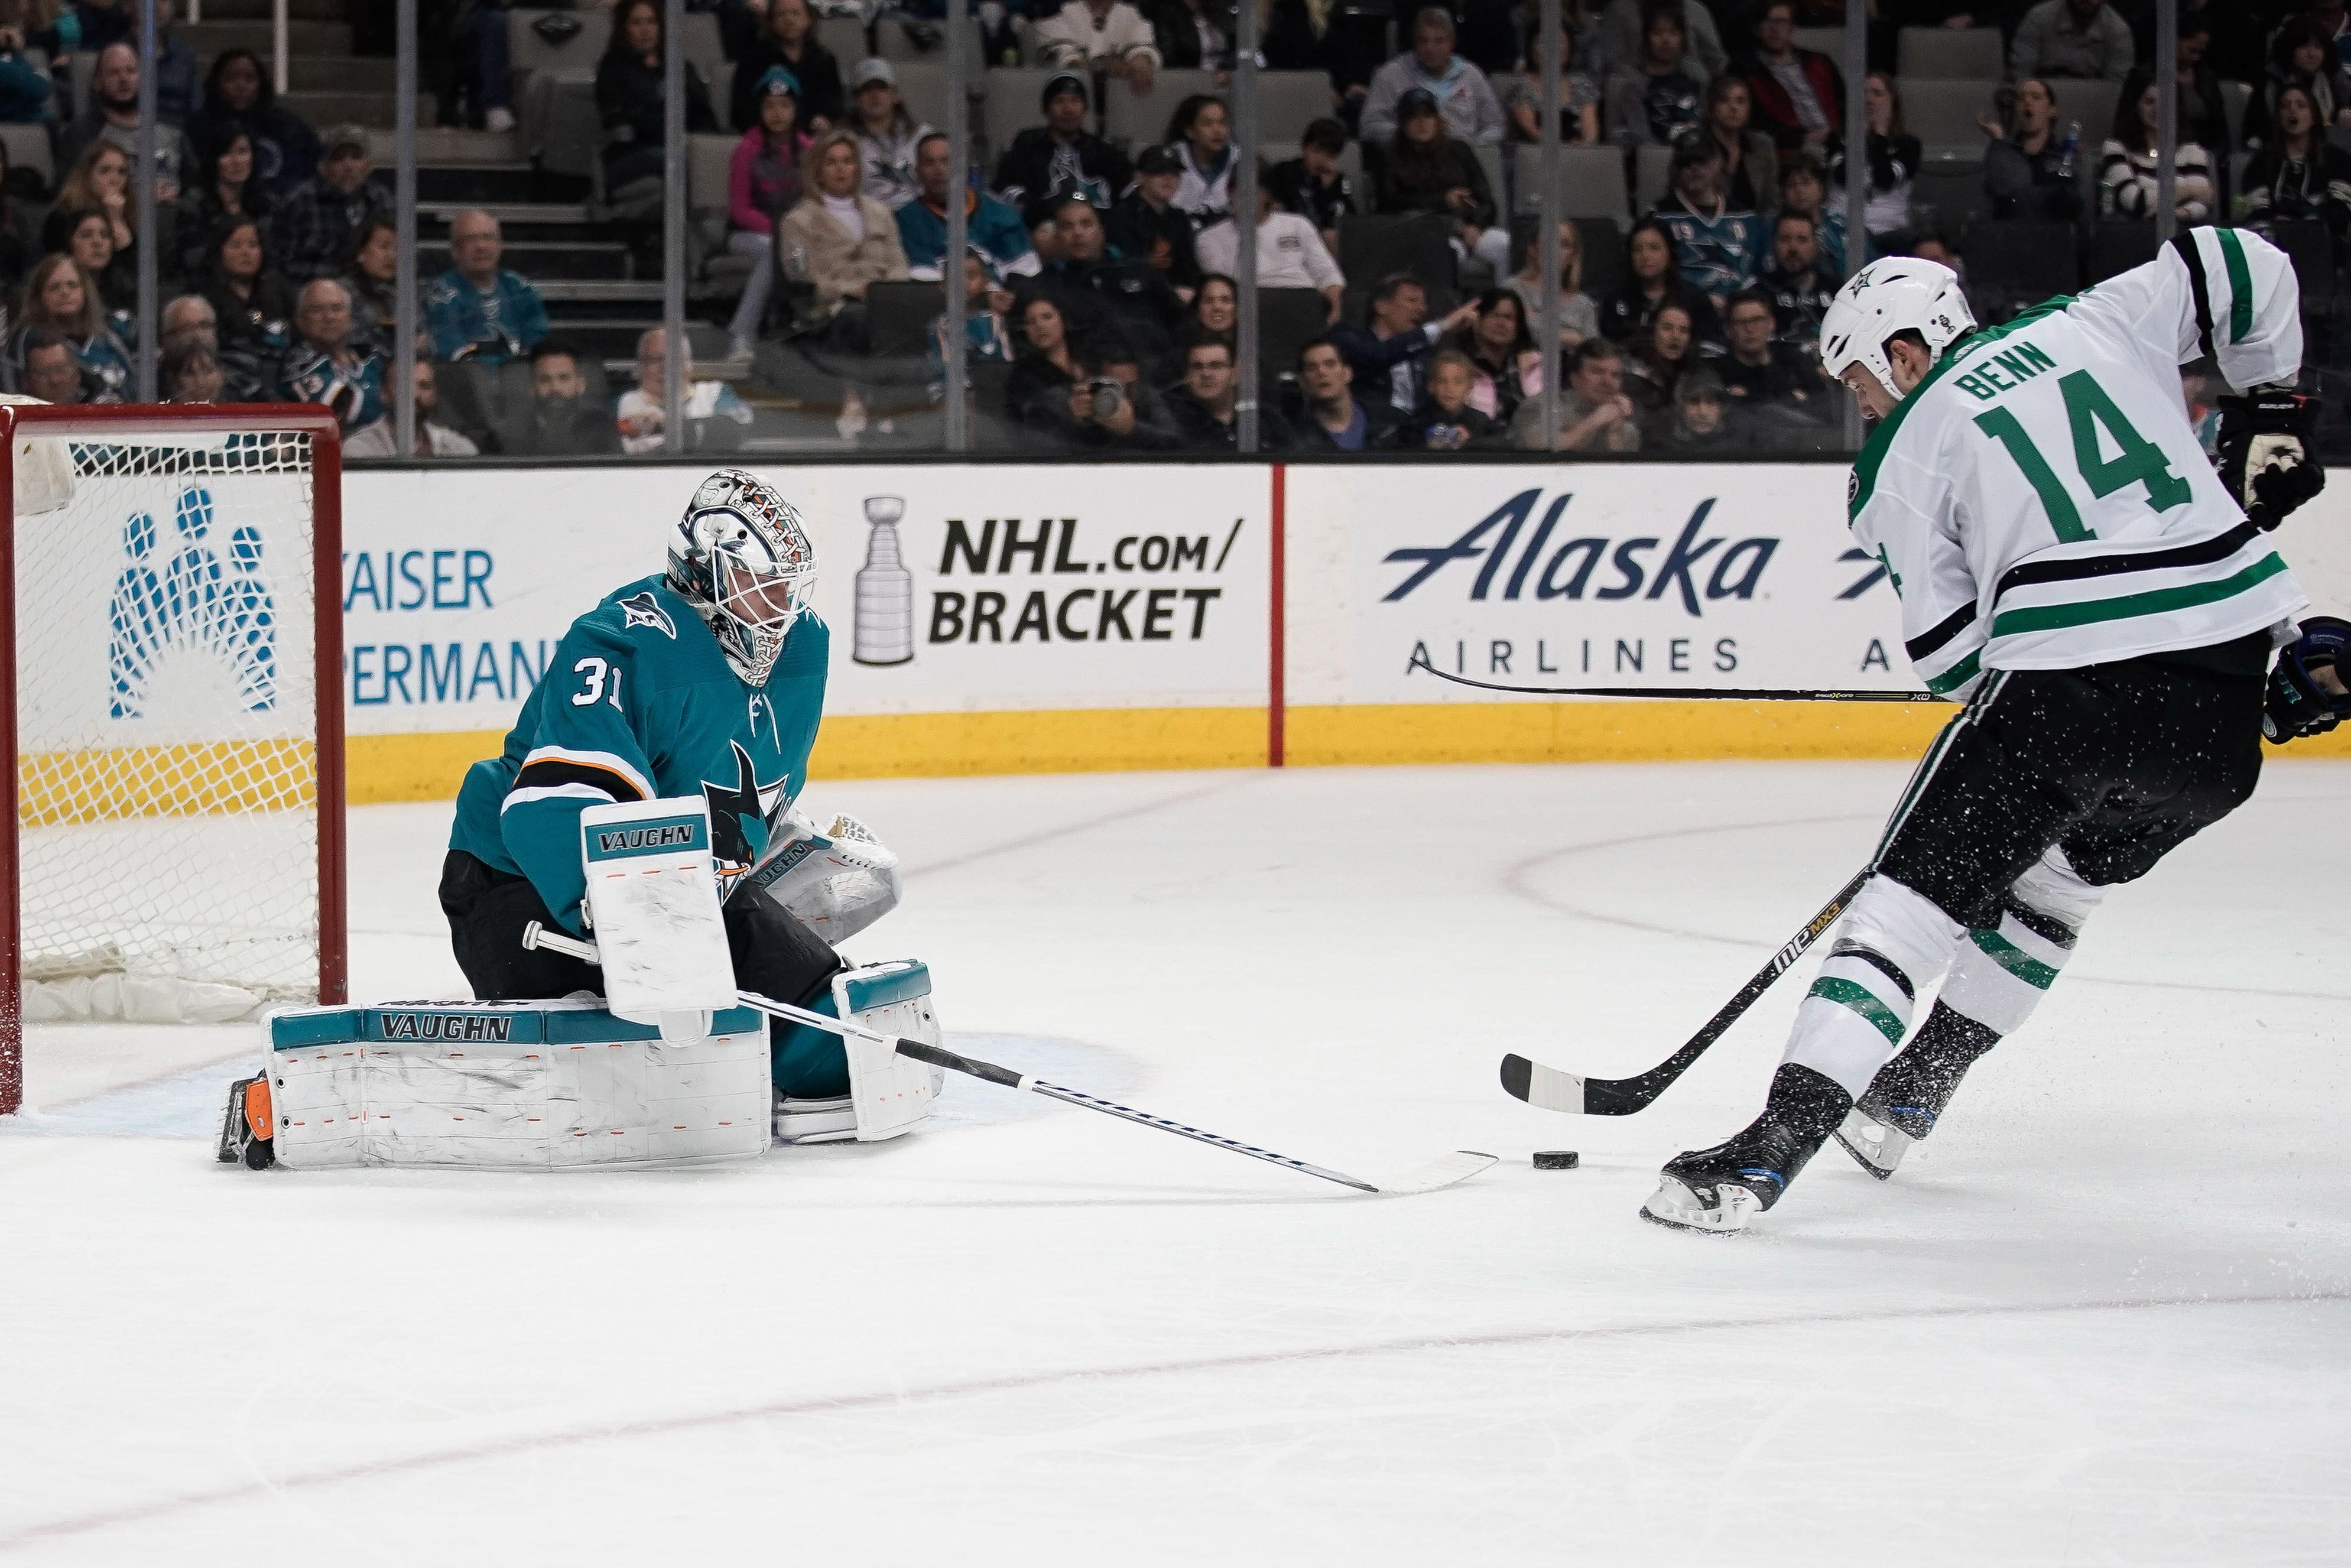 Apr 3, 2018; San Jose, CA, USA; San Jose Sharks goaltender Martin Jones (31) attempts to defend against Dallas Stars left wing Jamie Benn (14) during the third period at SAP Center at San Jose.